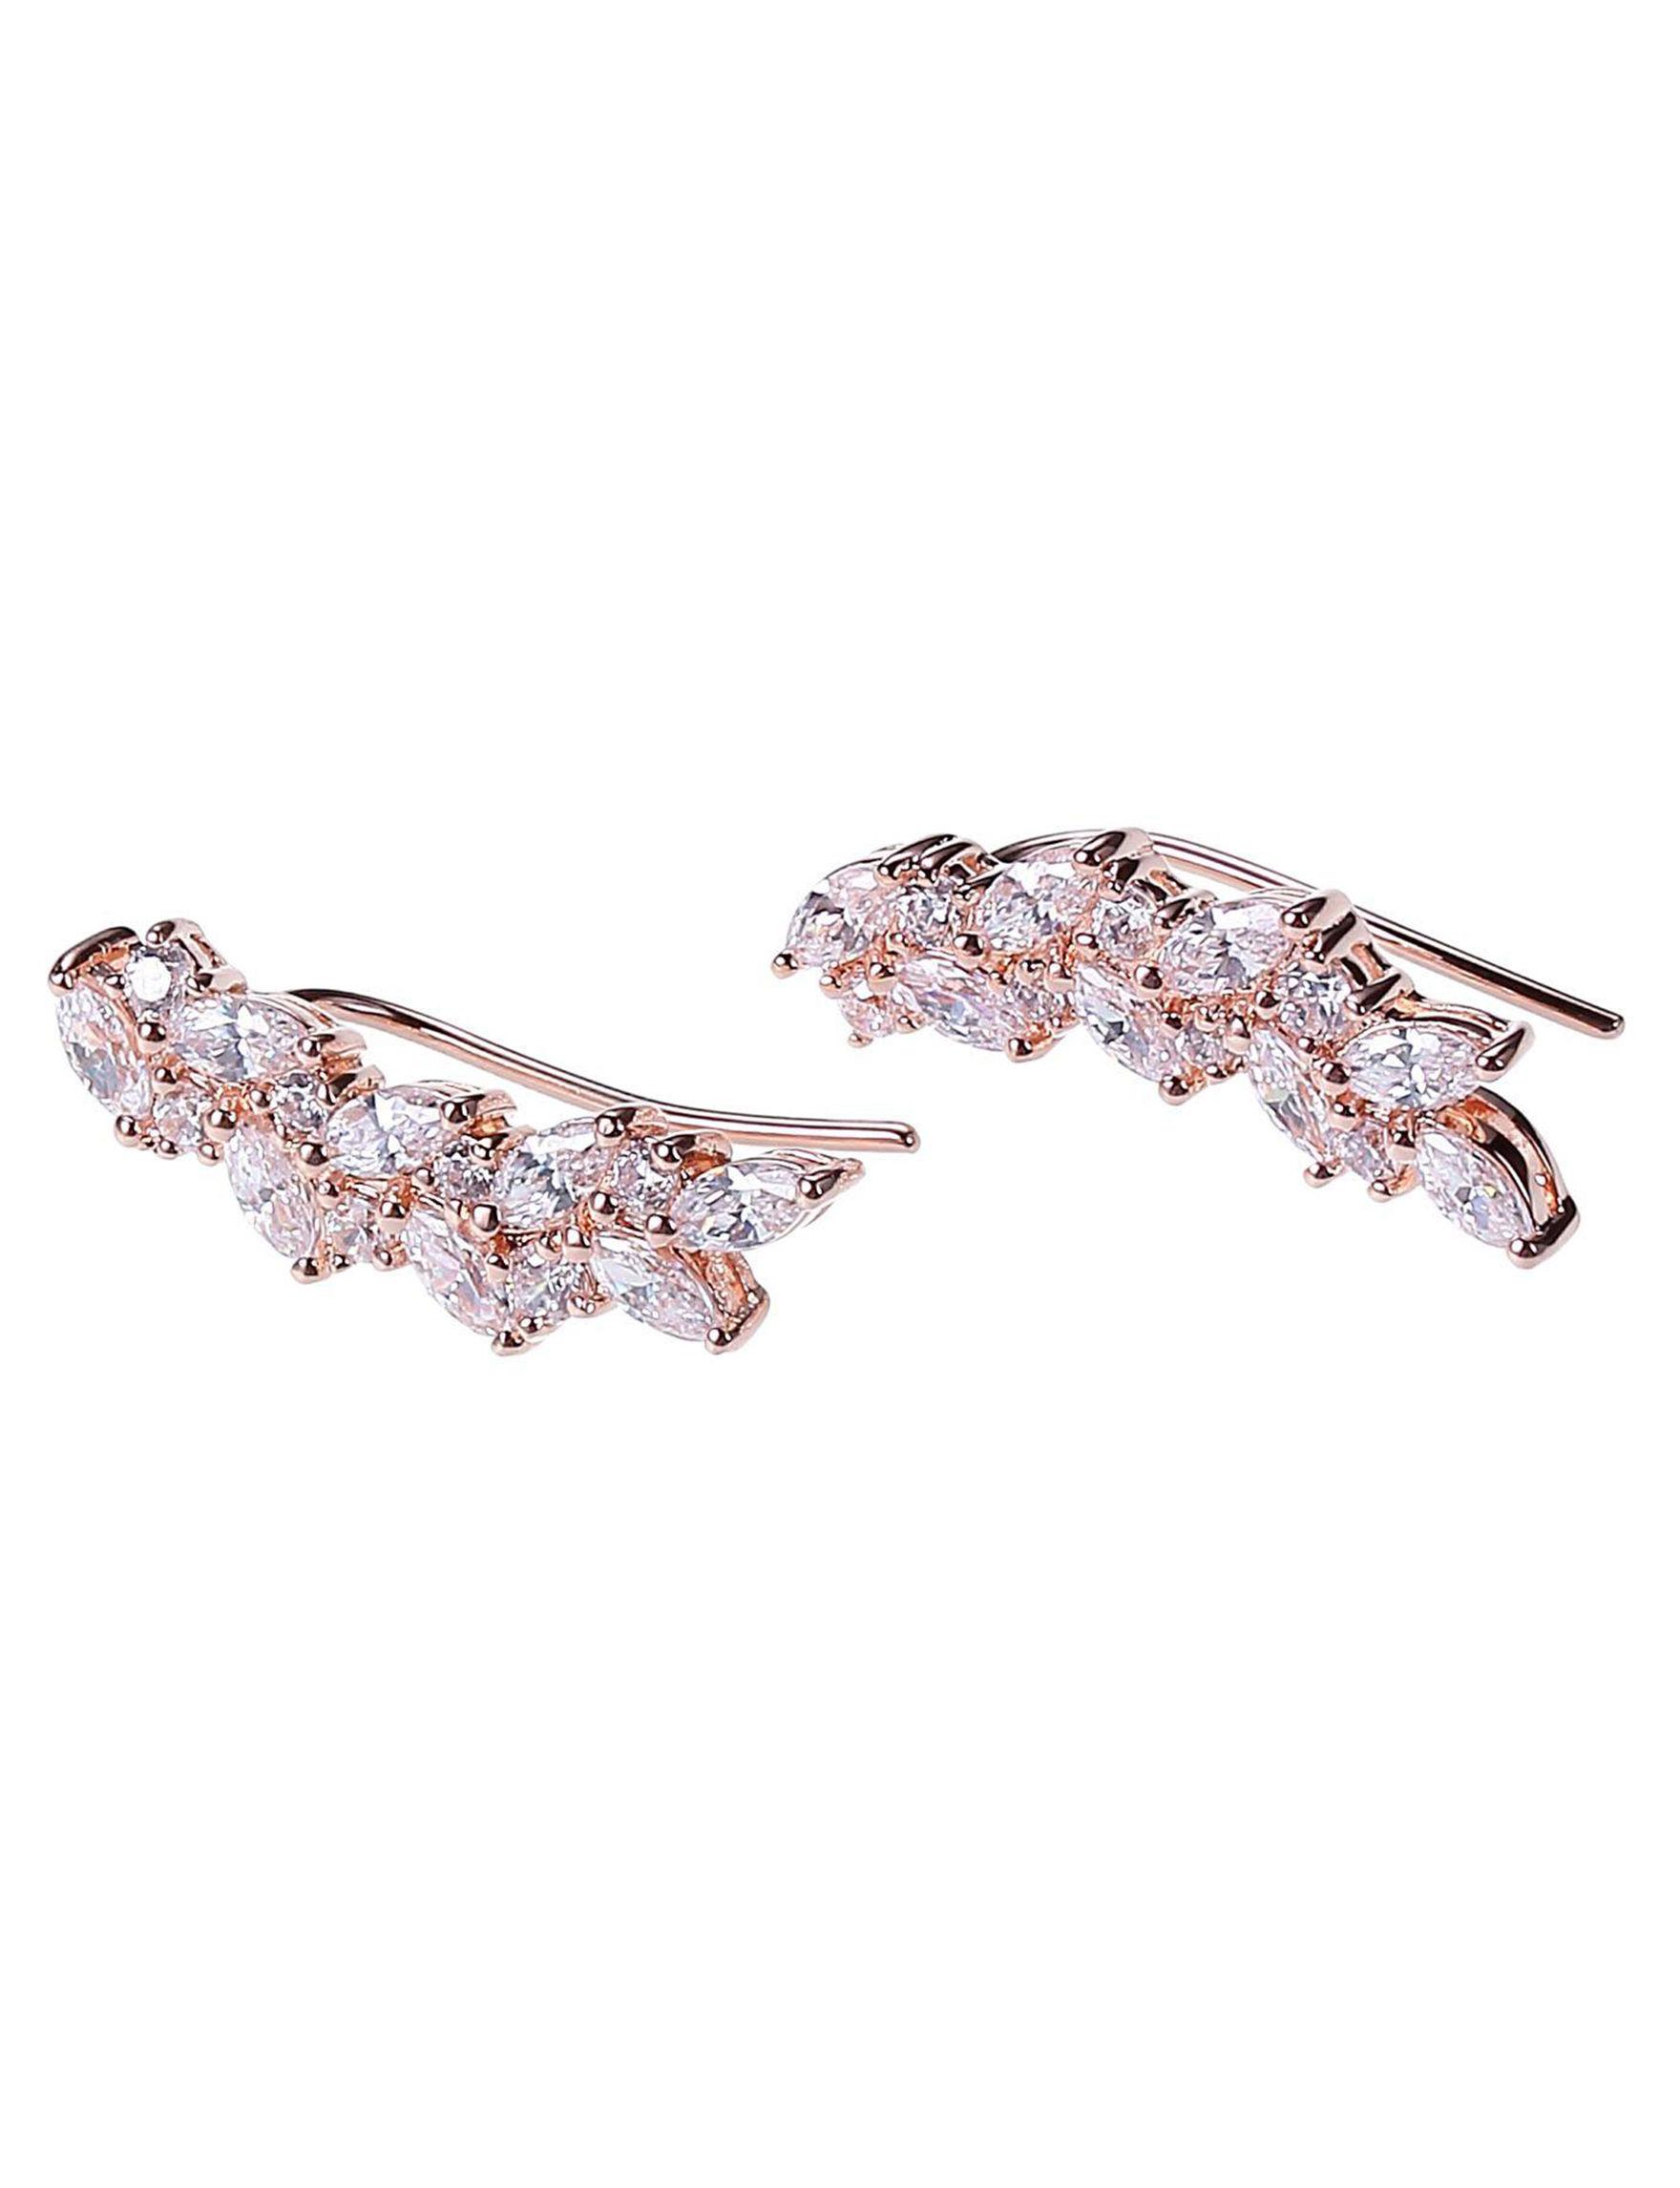 PAJ INC. Rose Gold / Crystal Earrings Fine Jewelry